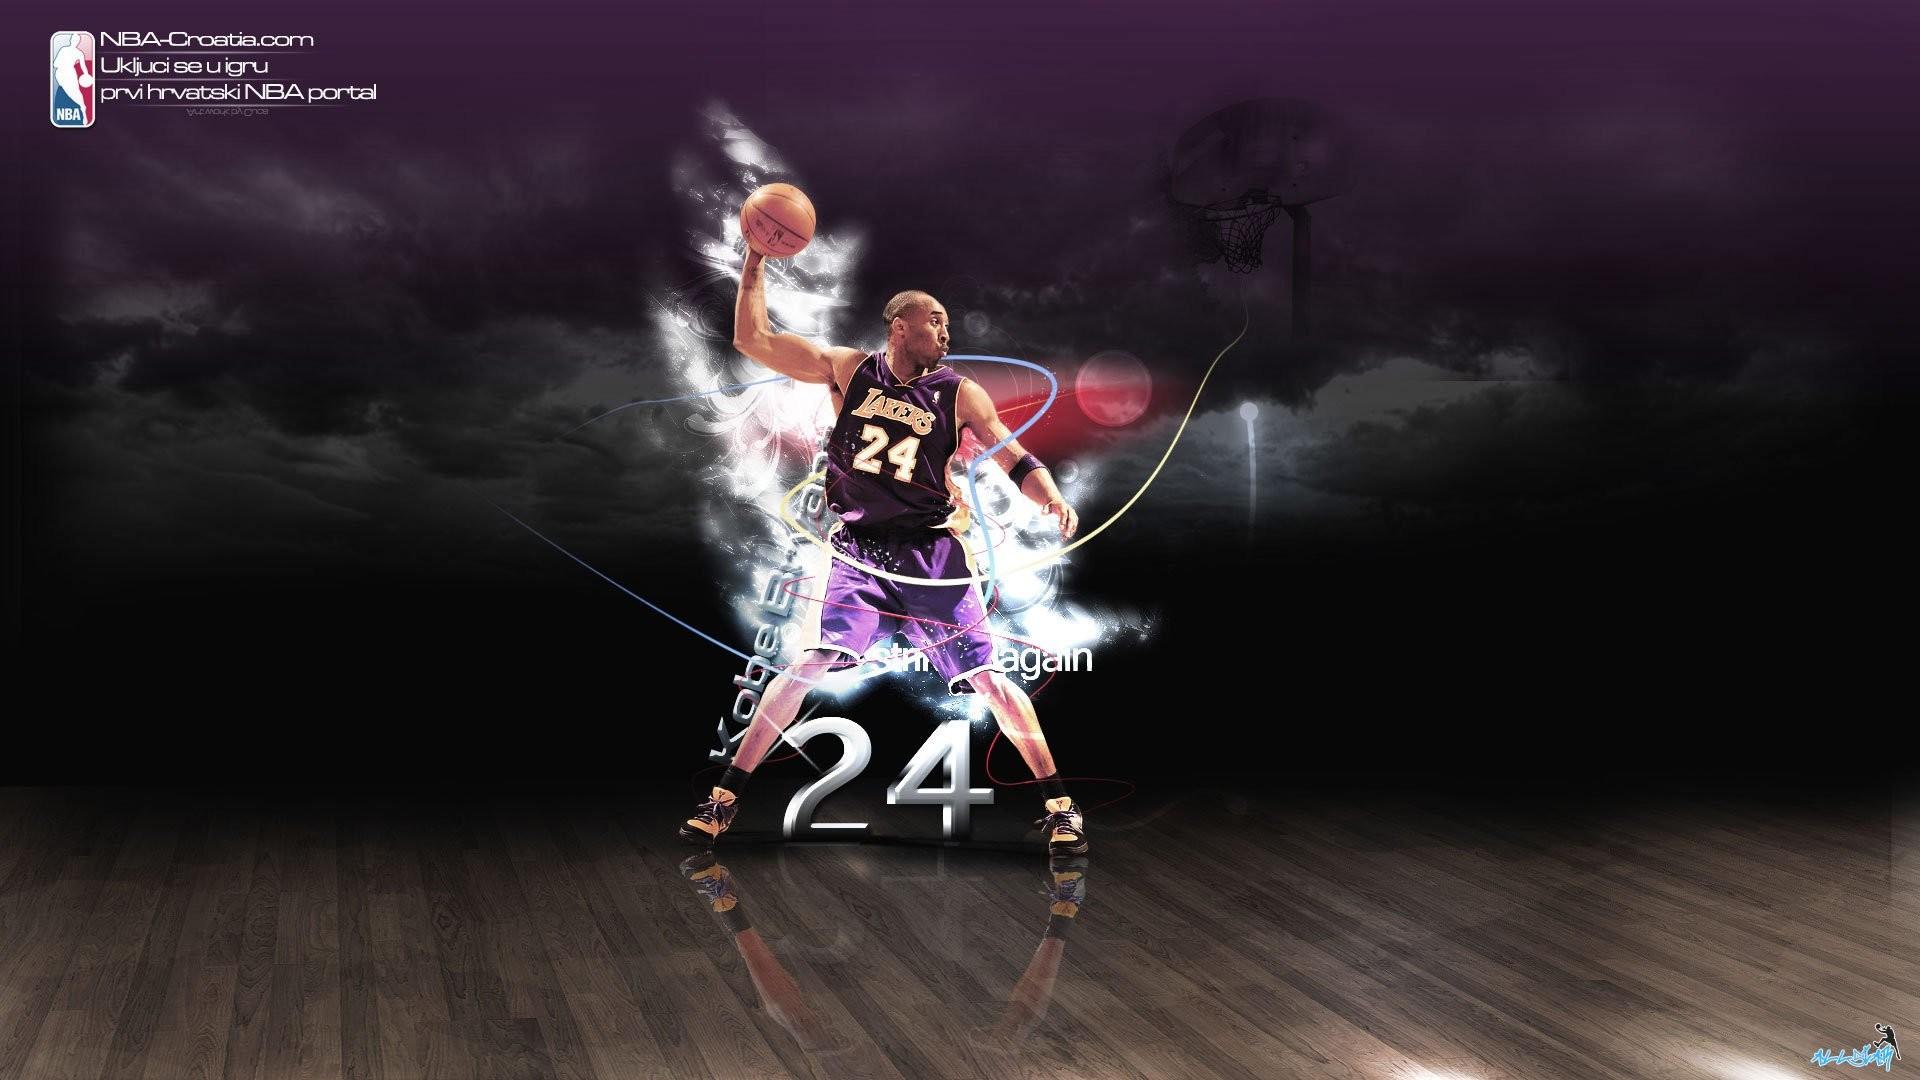 … Kobe Bryant lakers w.